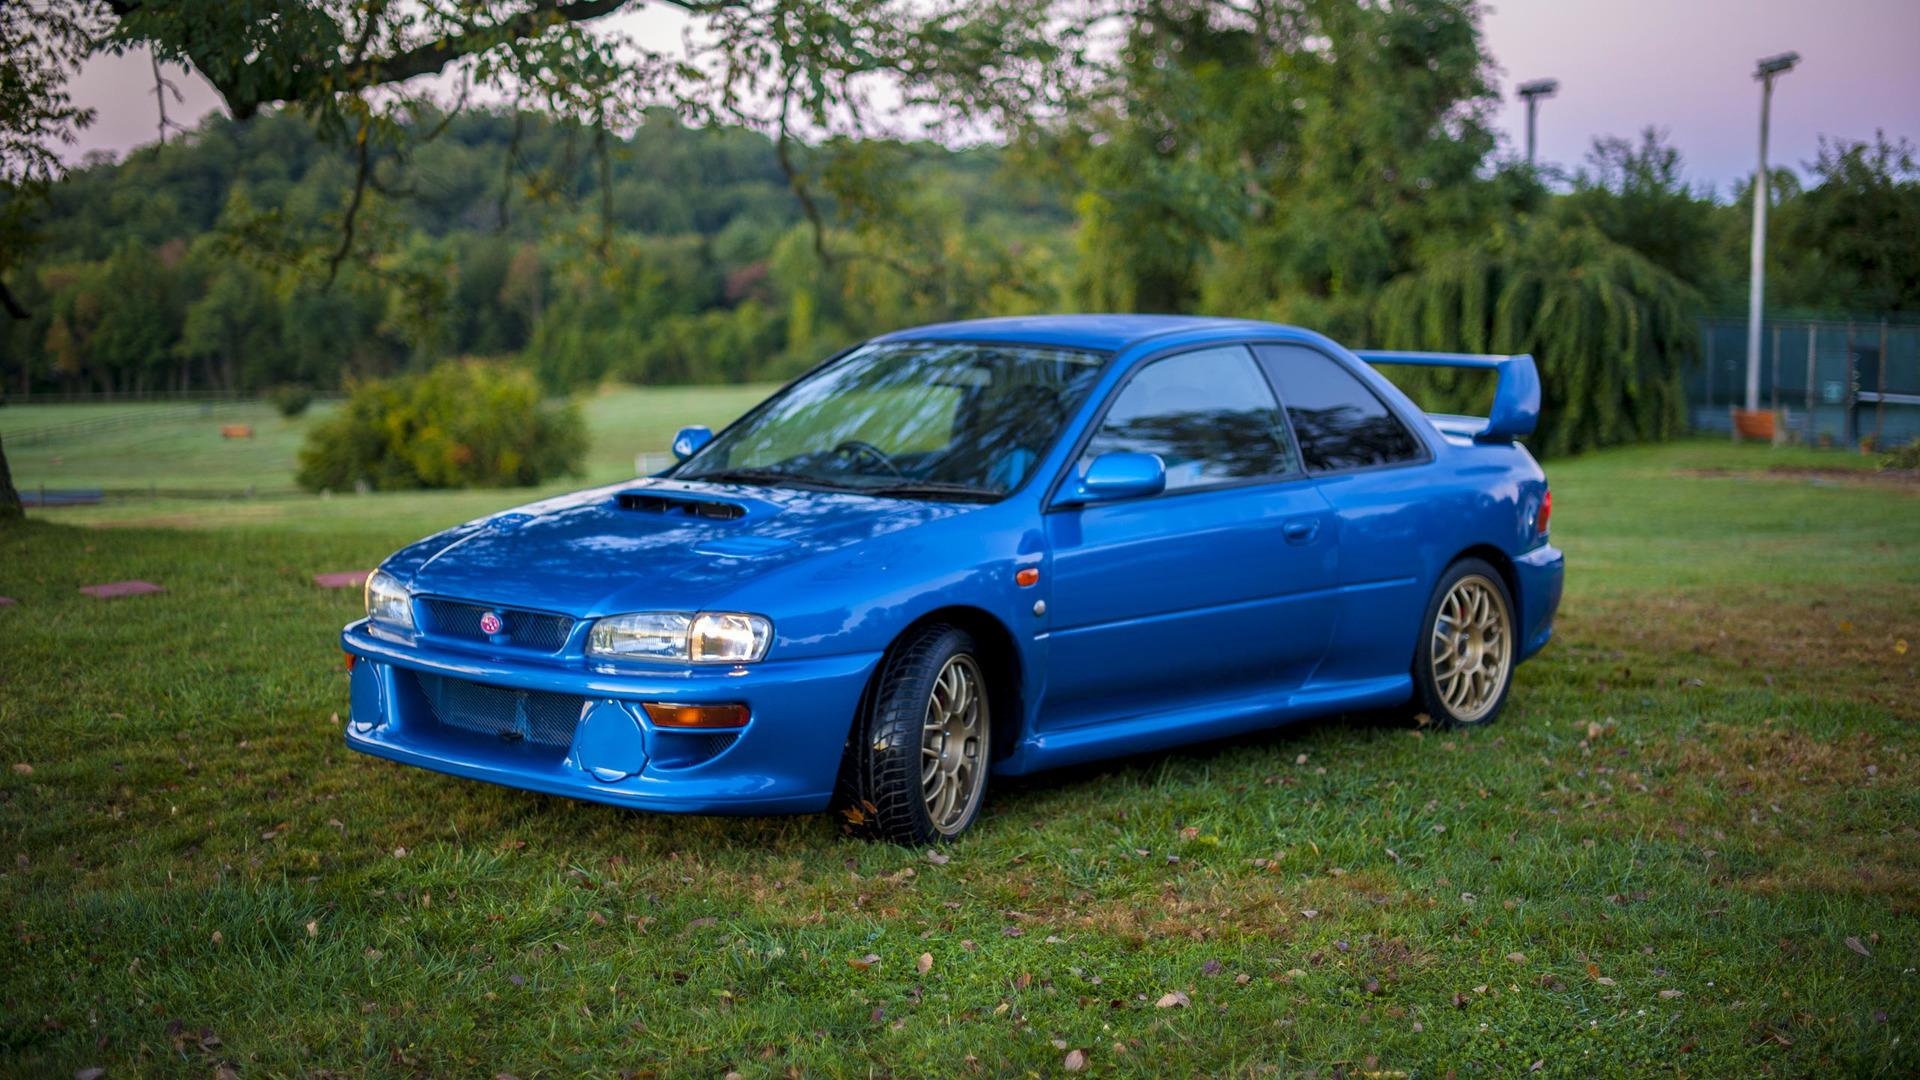 Imagining a modern day Subaru 22B STi